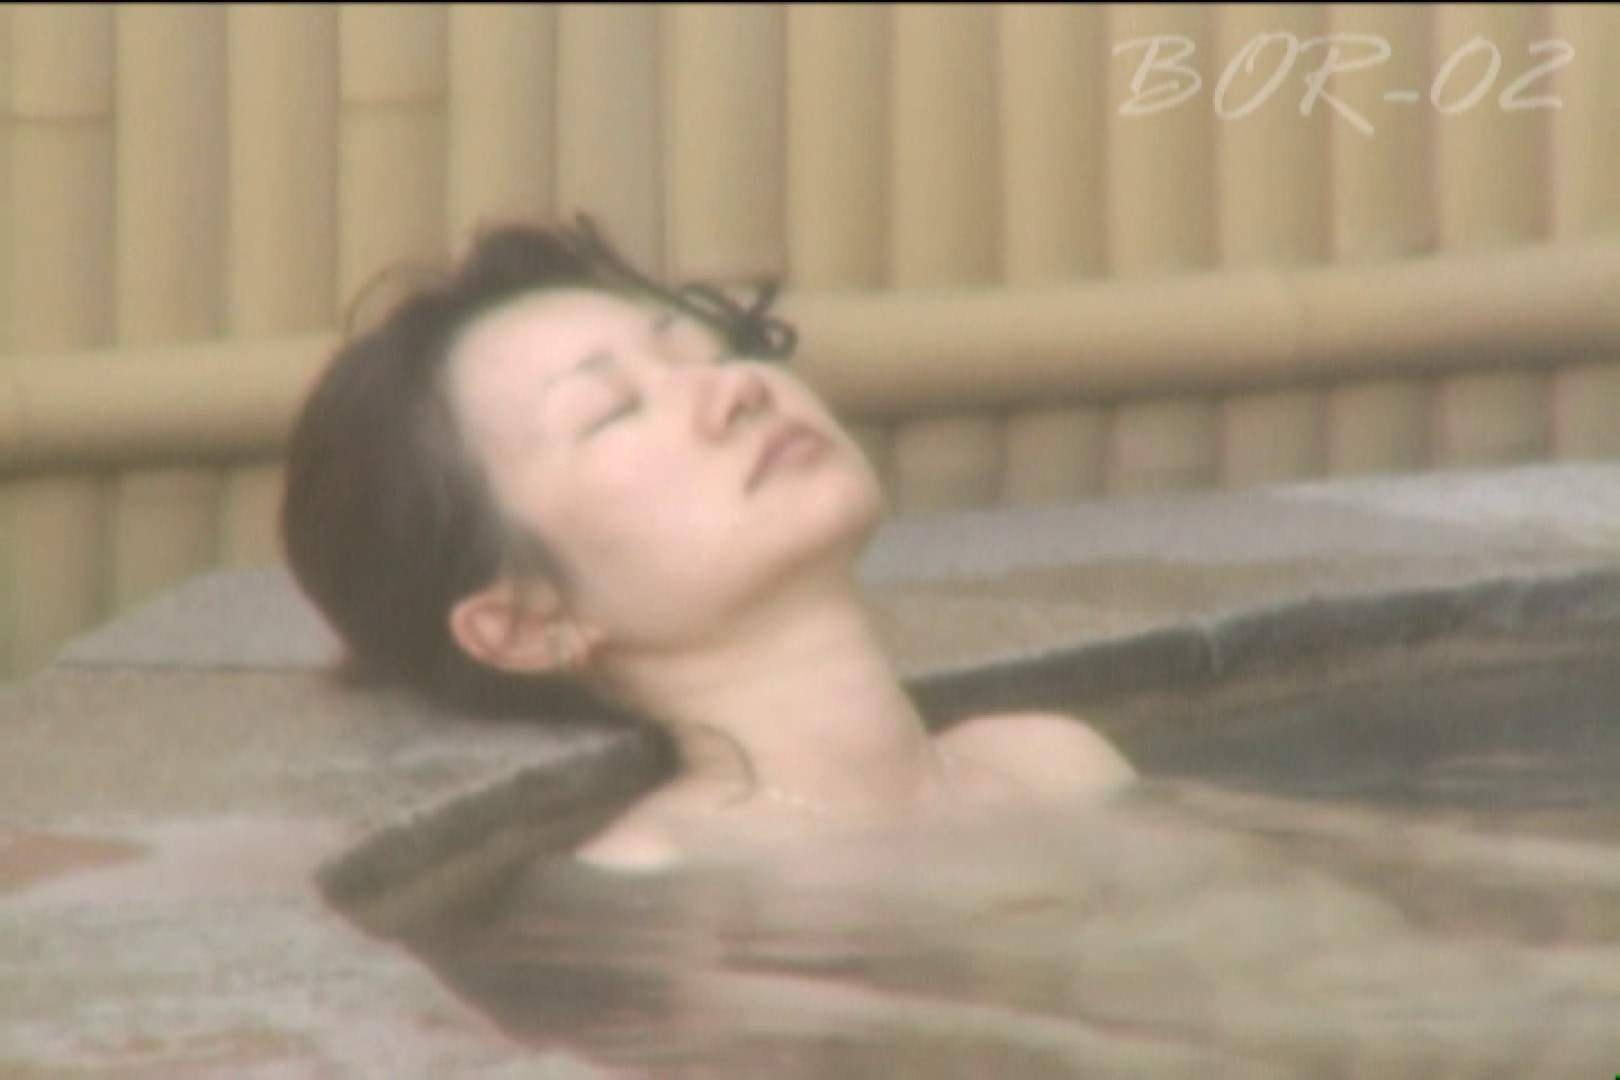 Aquaな露天風呂Vol.477 盗撮   OLエロ画像  99PICs 43